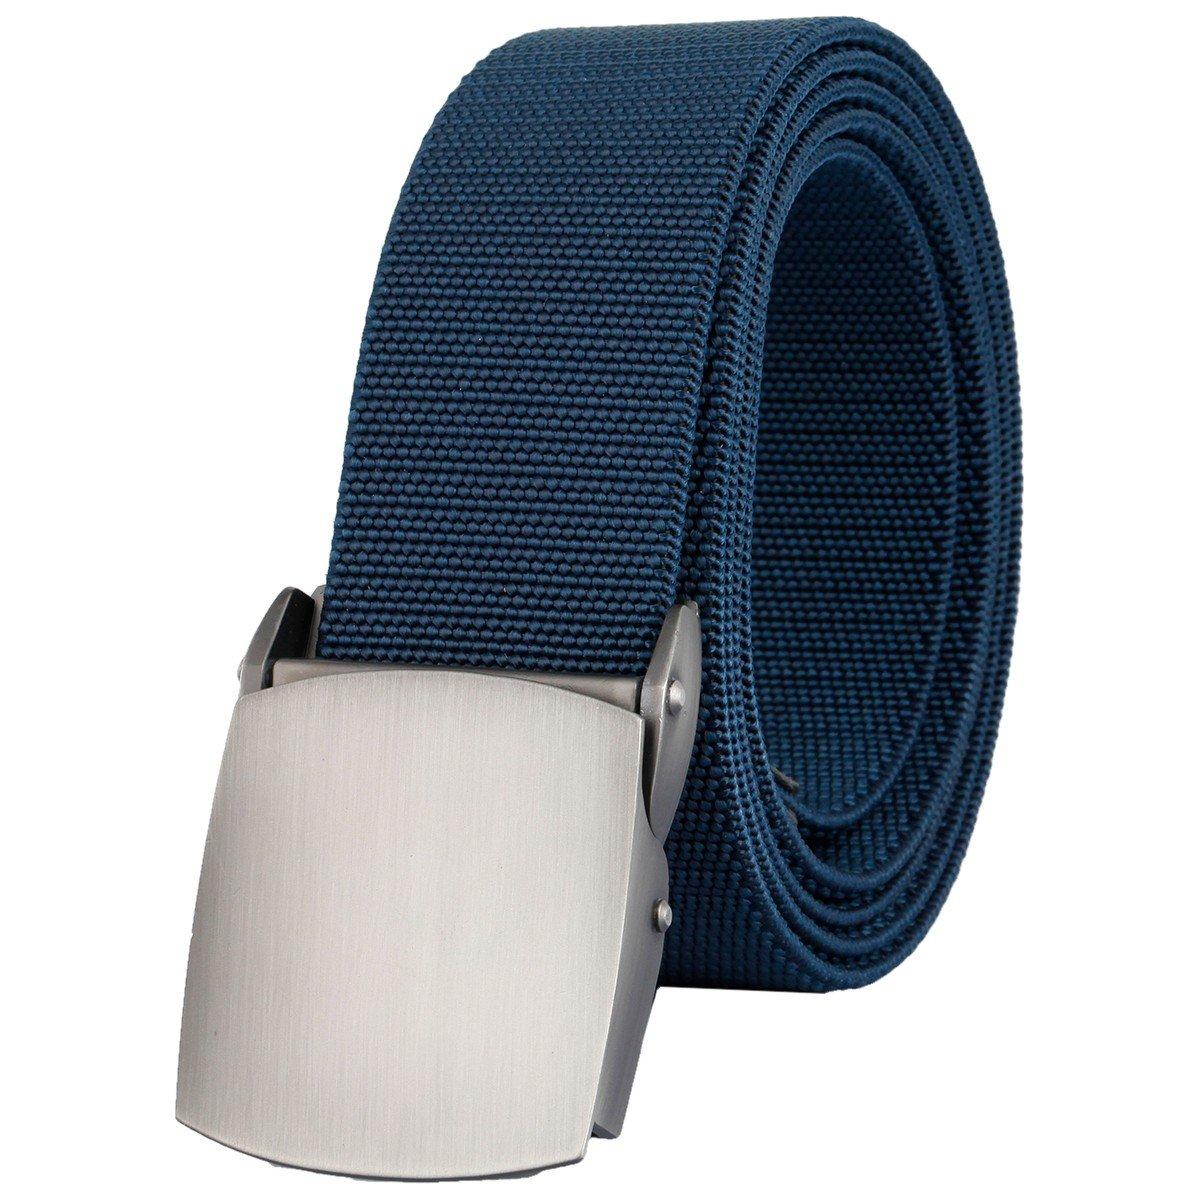 Sportmusies Men's Webbing Elastic Belt, Military Style Stretch Tactical Duty Belt